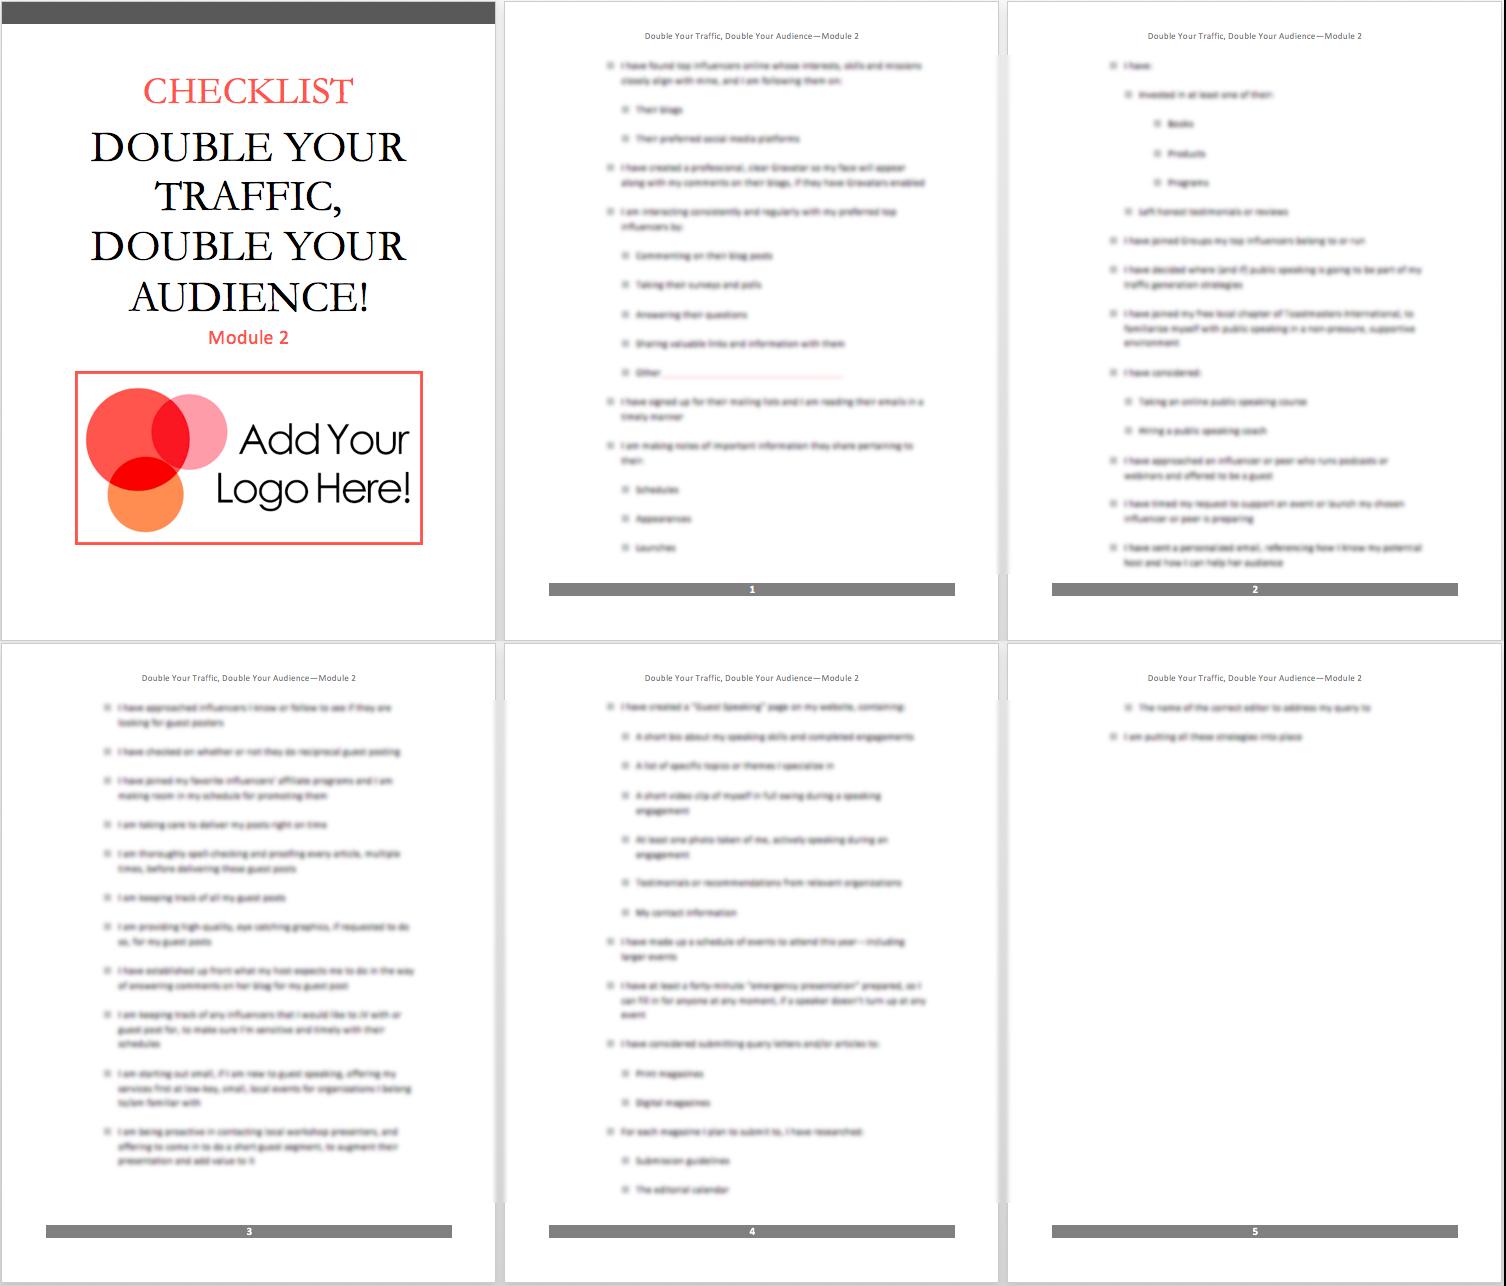 mod 2 checklist